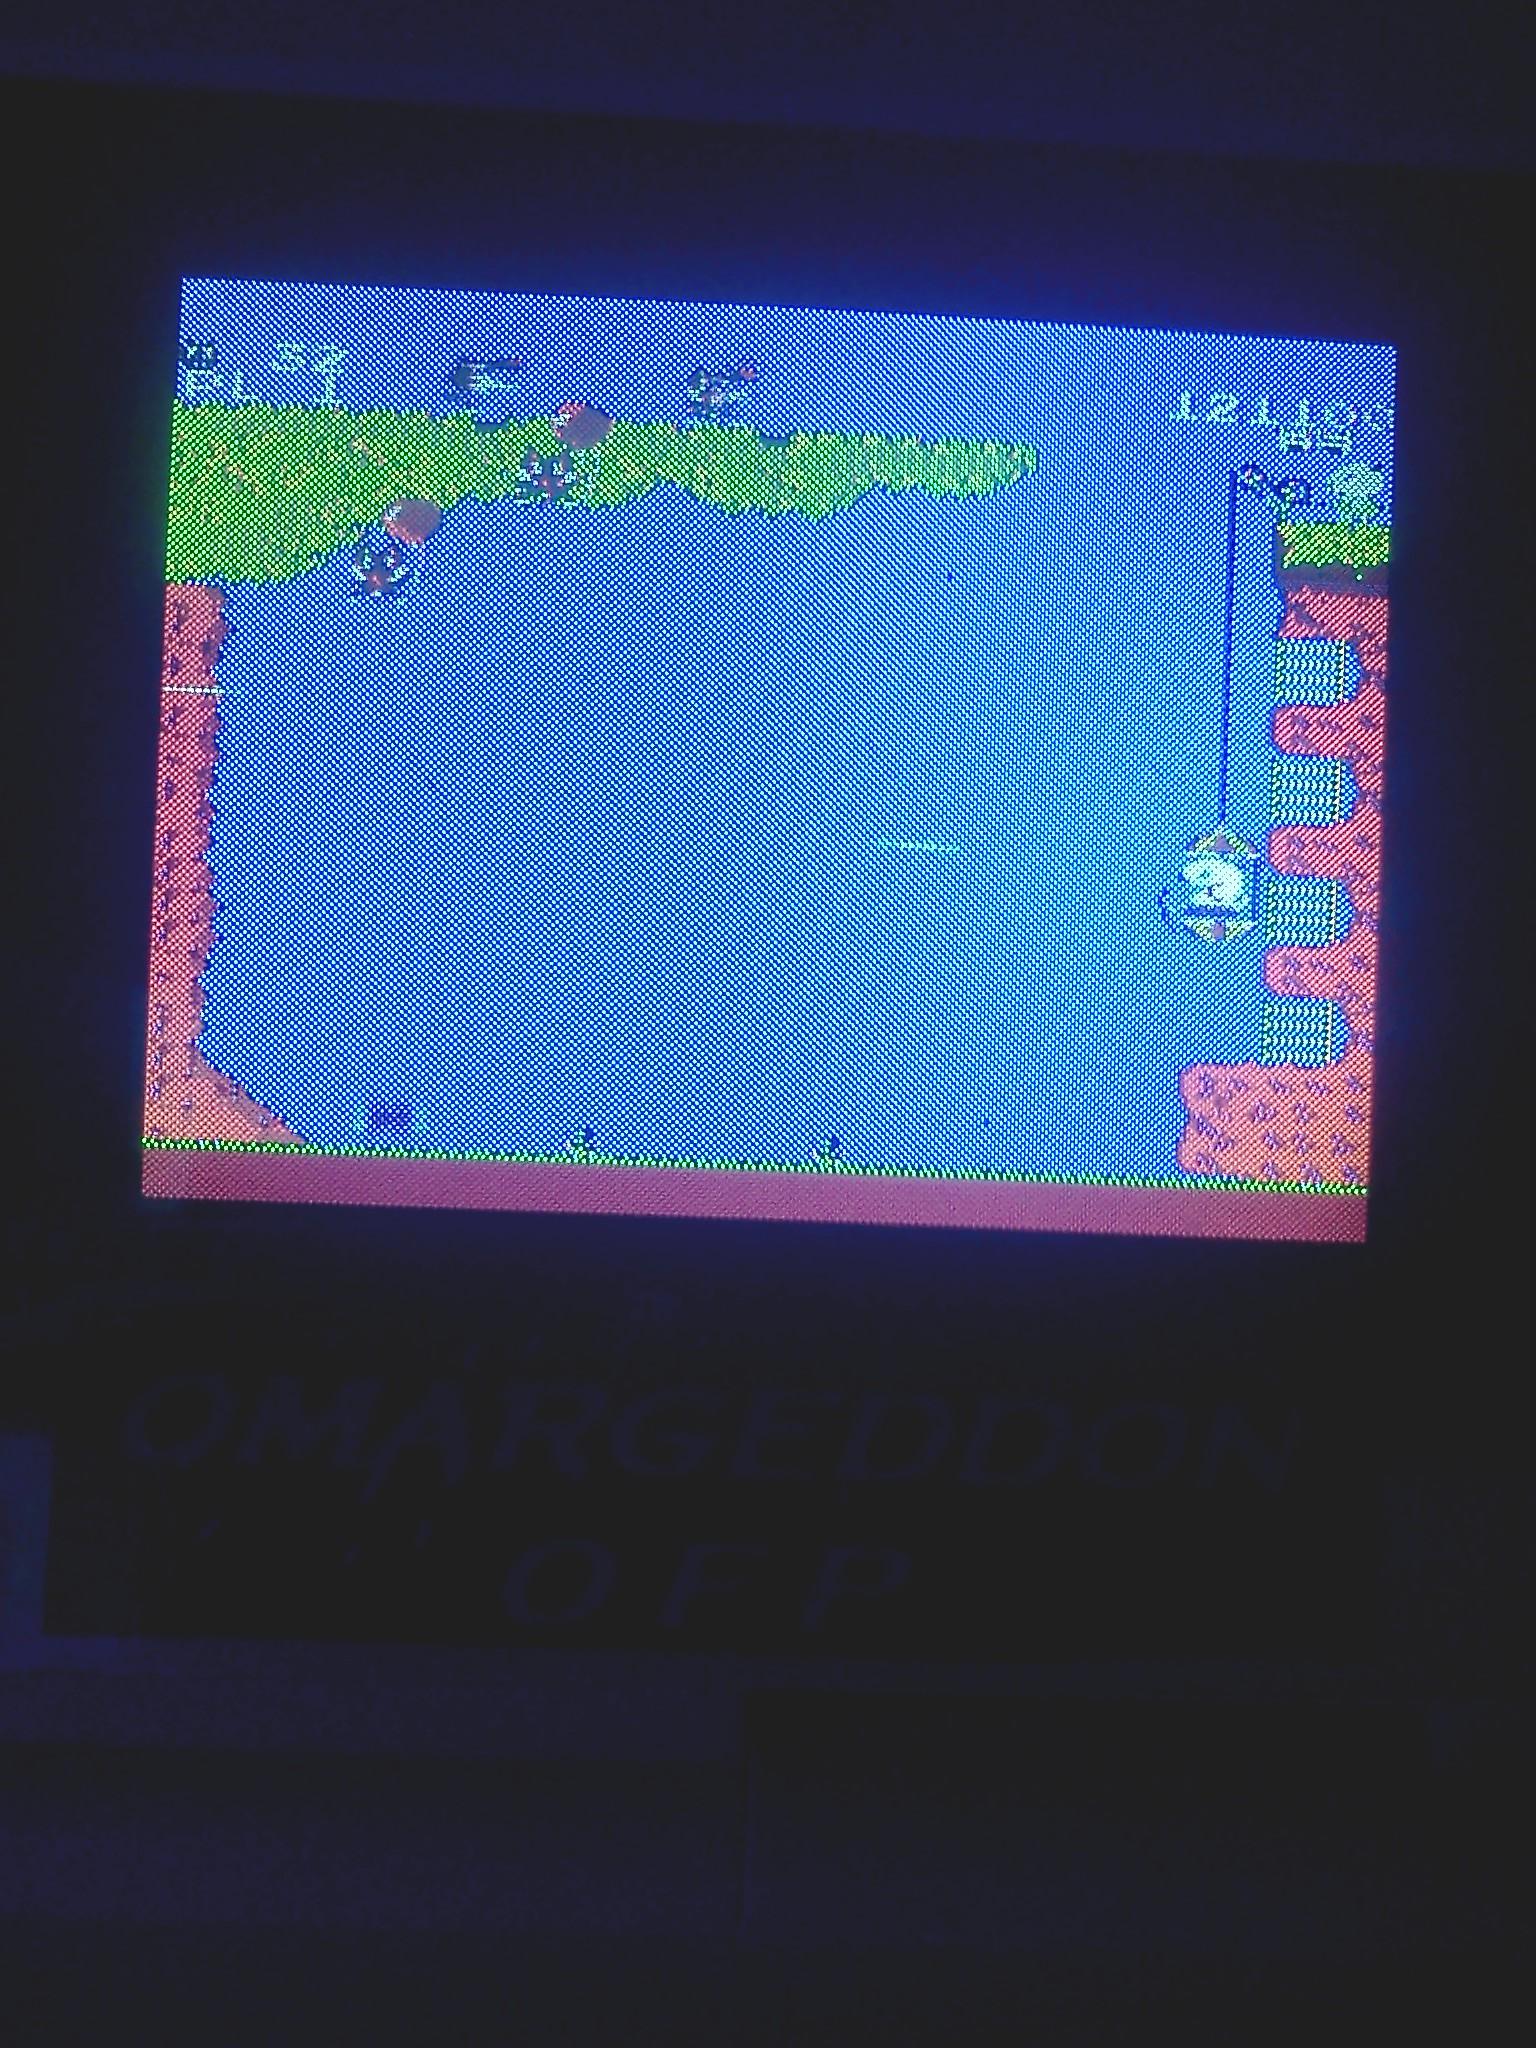 omargeddon: Pooyan (NES/Famicom Emulated) 121,100 points on 2016-07-29 01:20:01